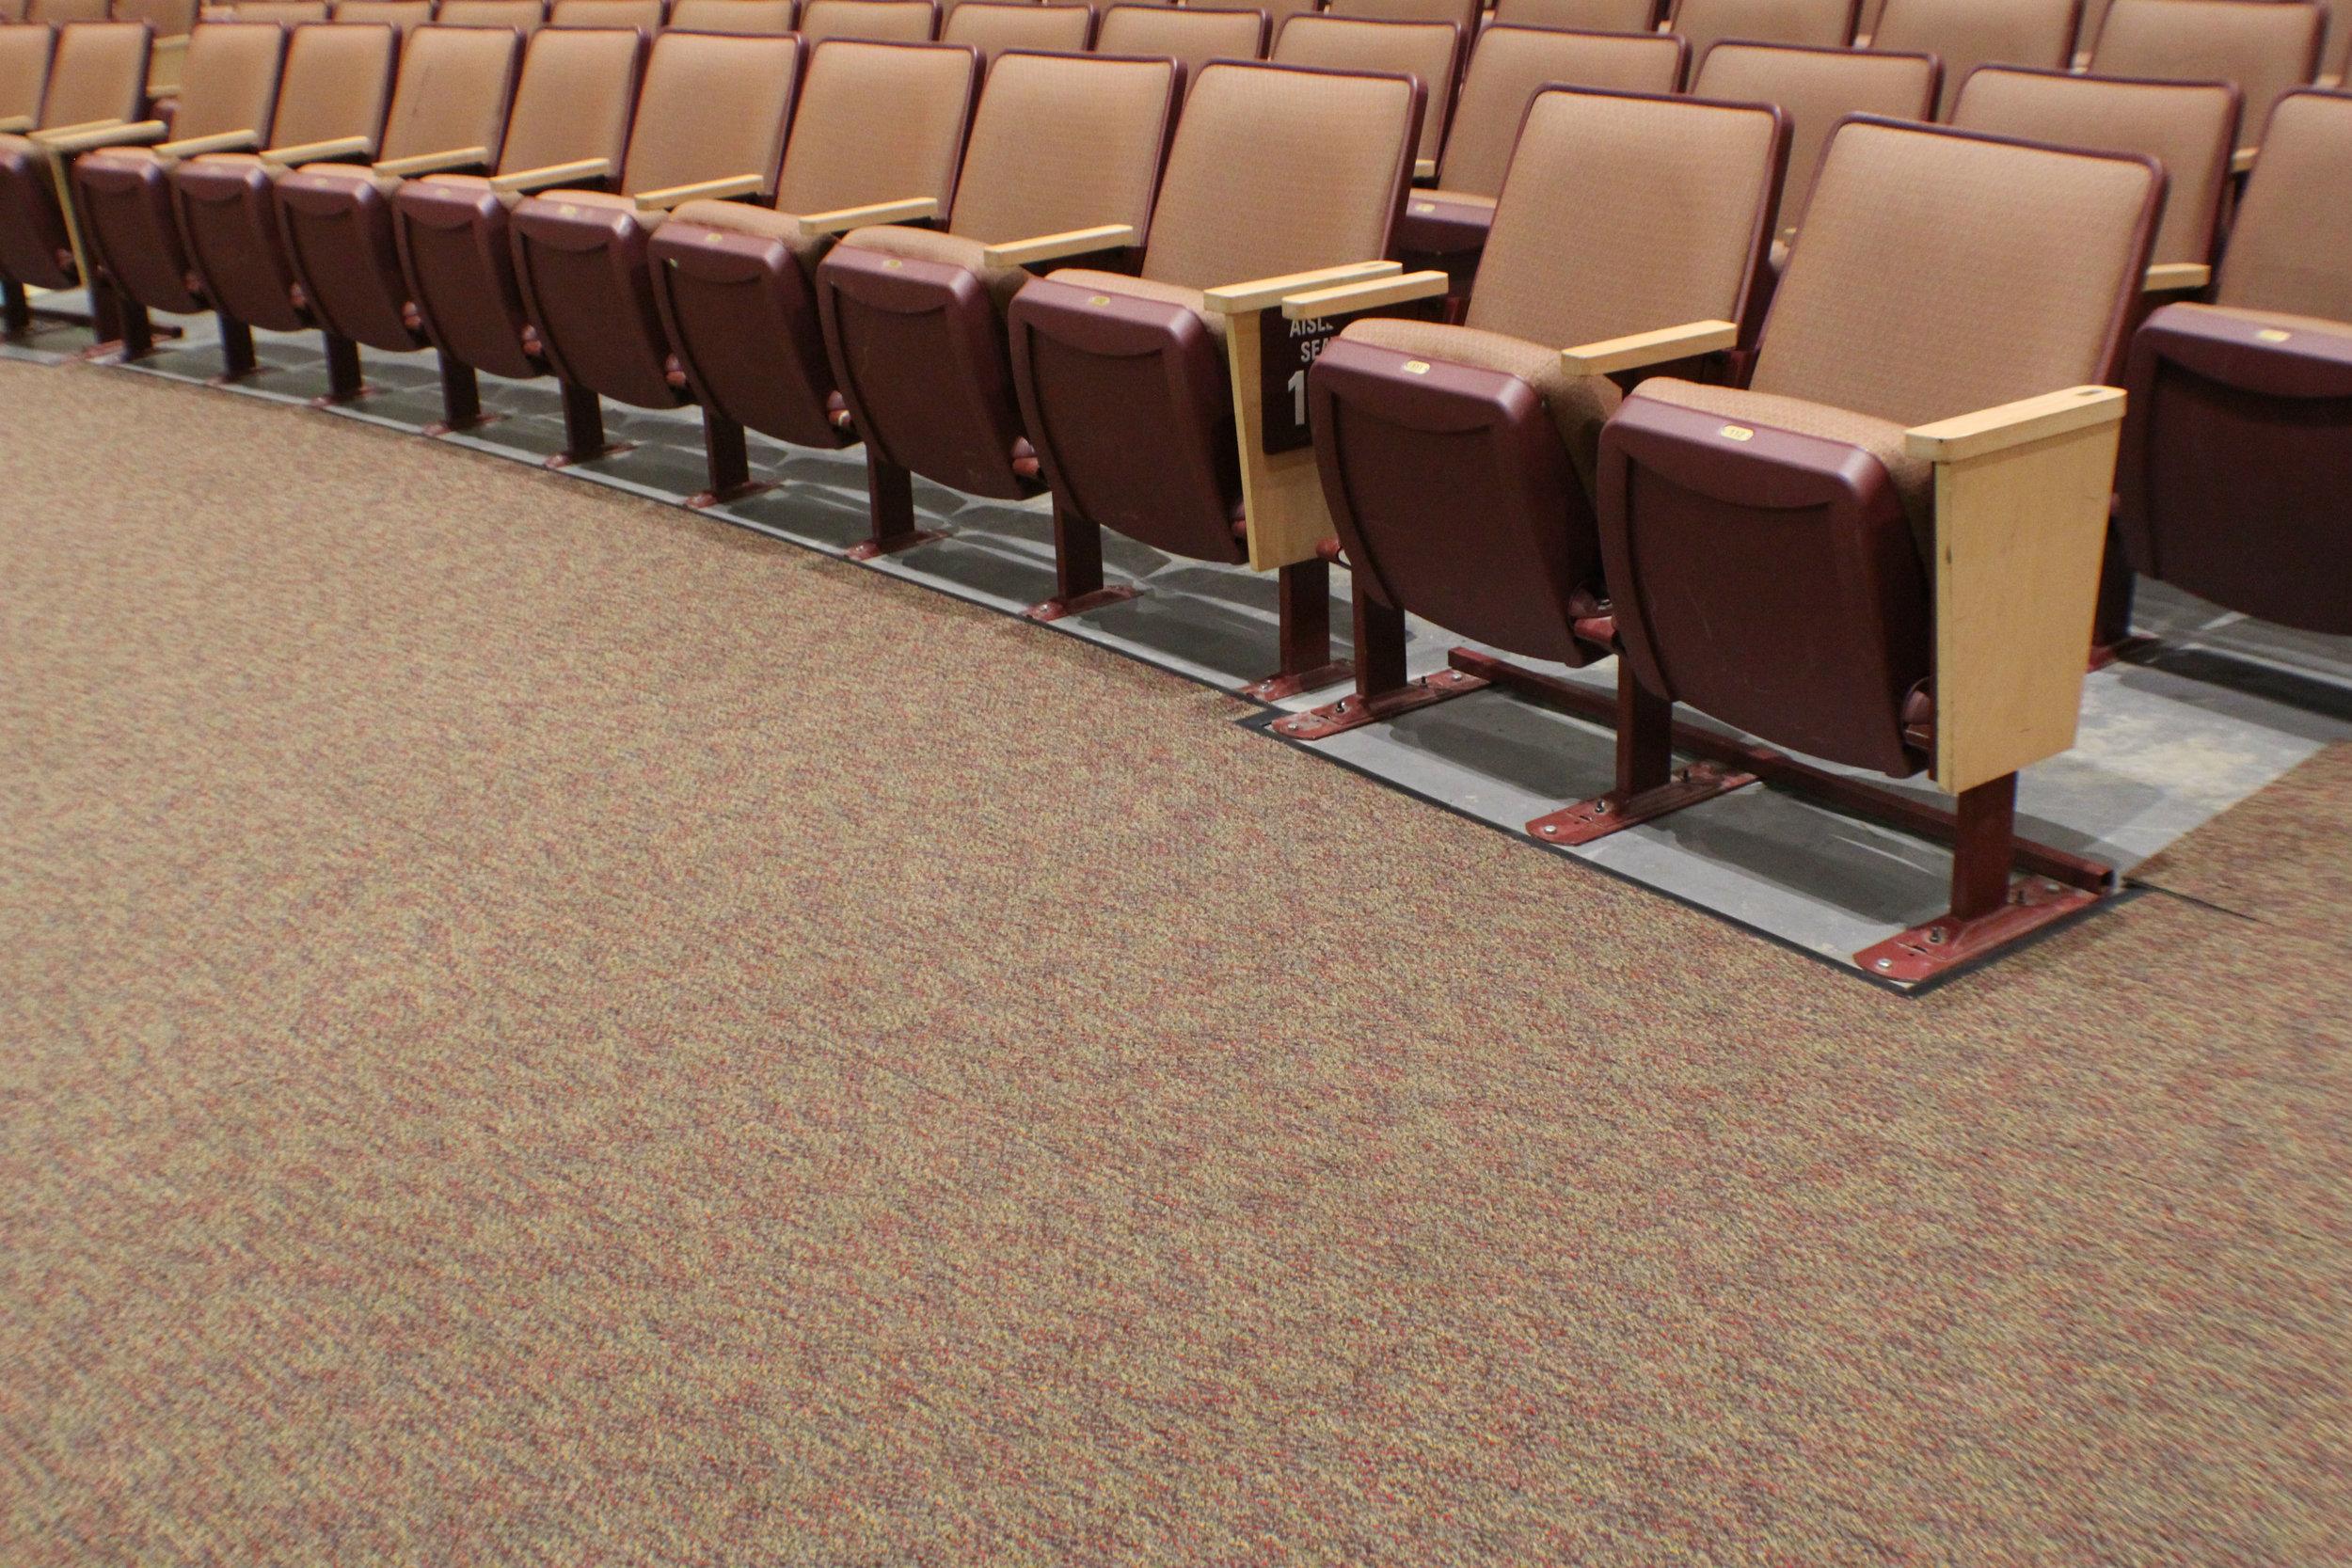 Town of Reading x Atkinson Carpet & Flooring